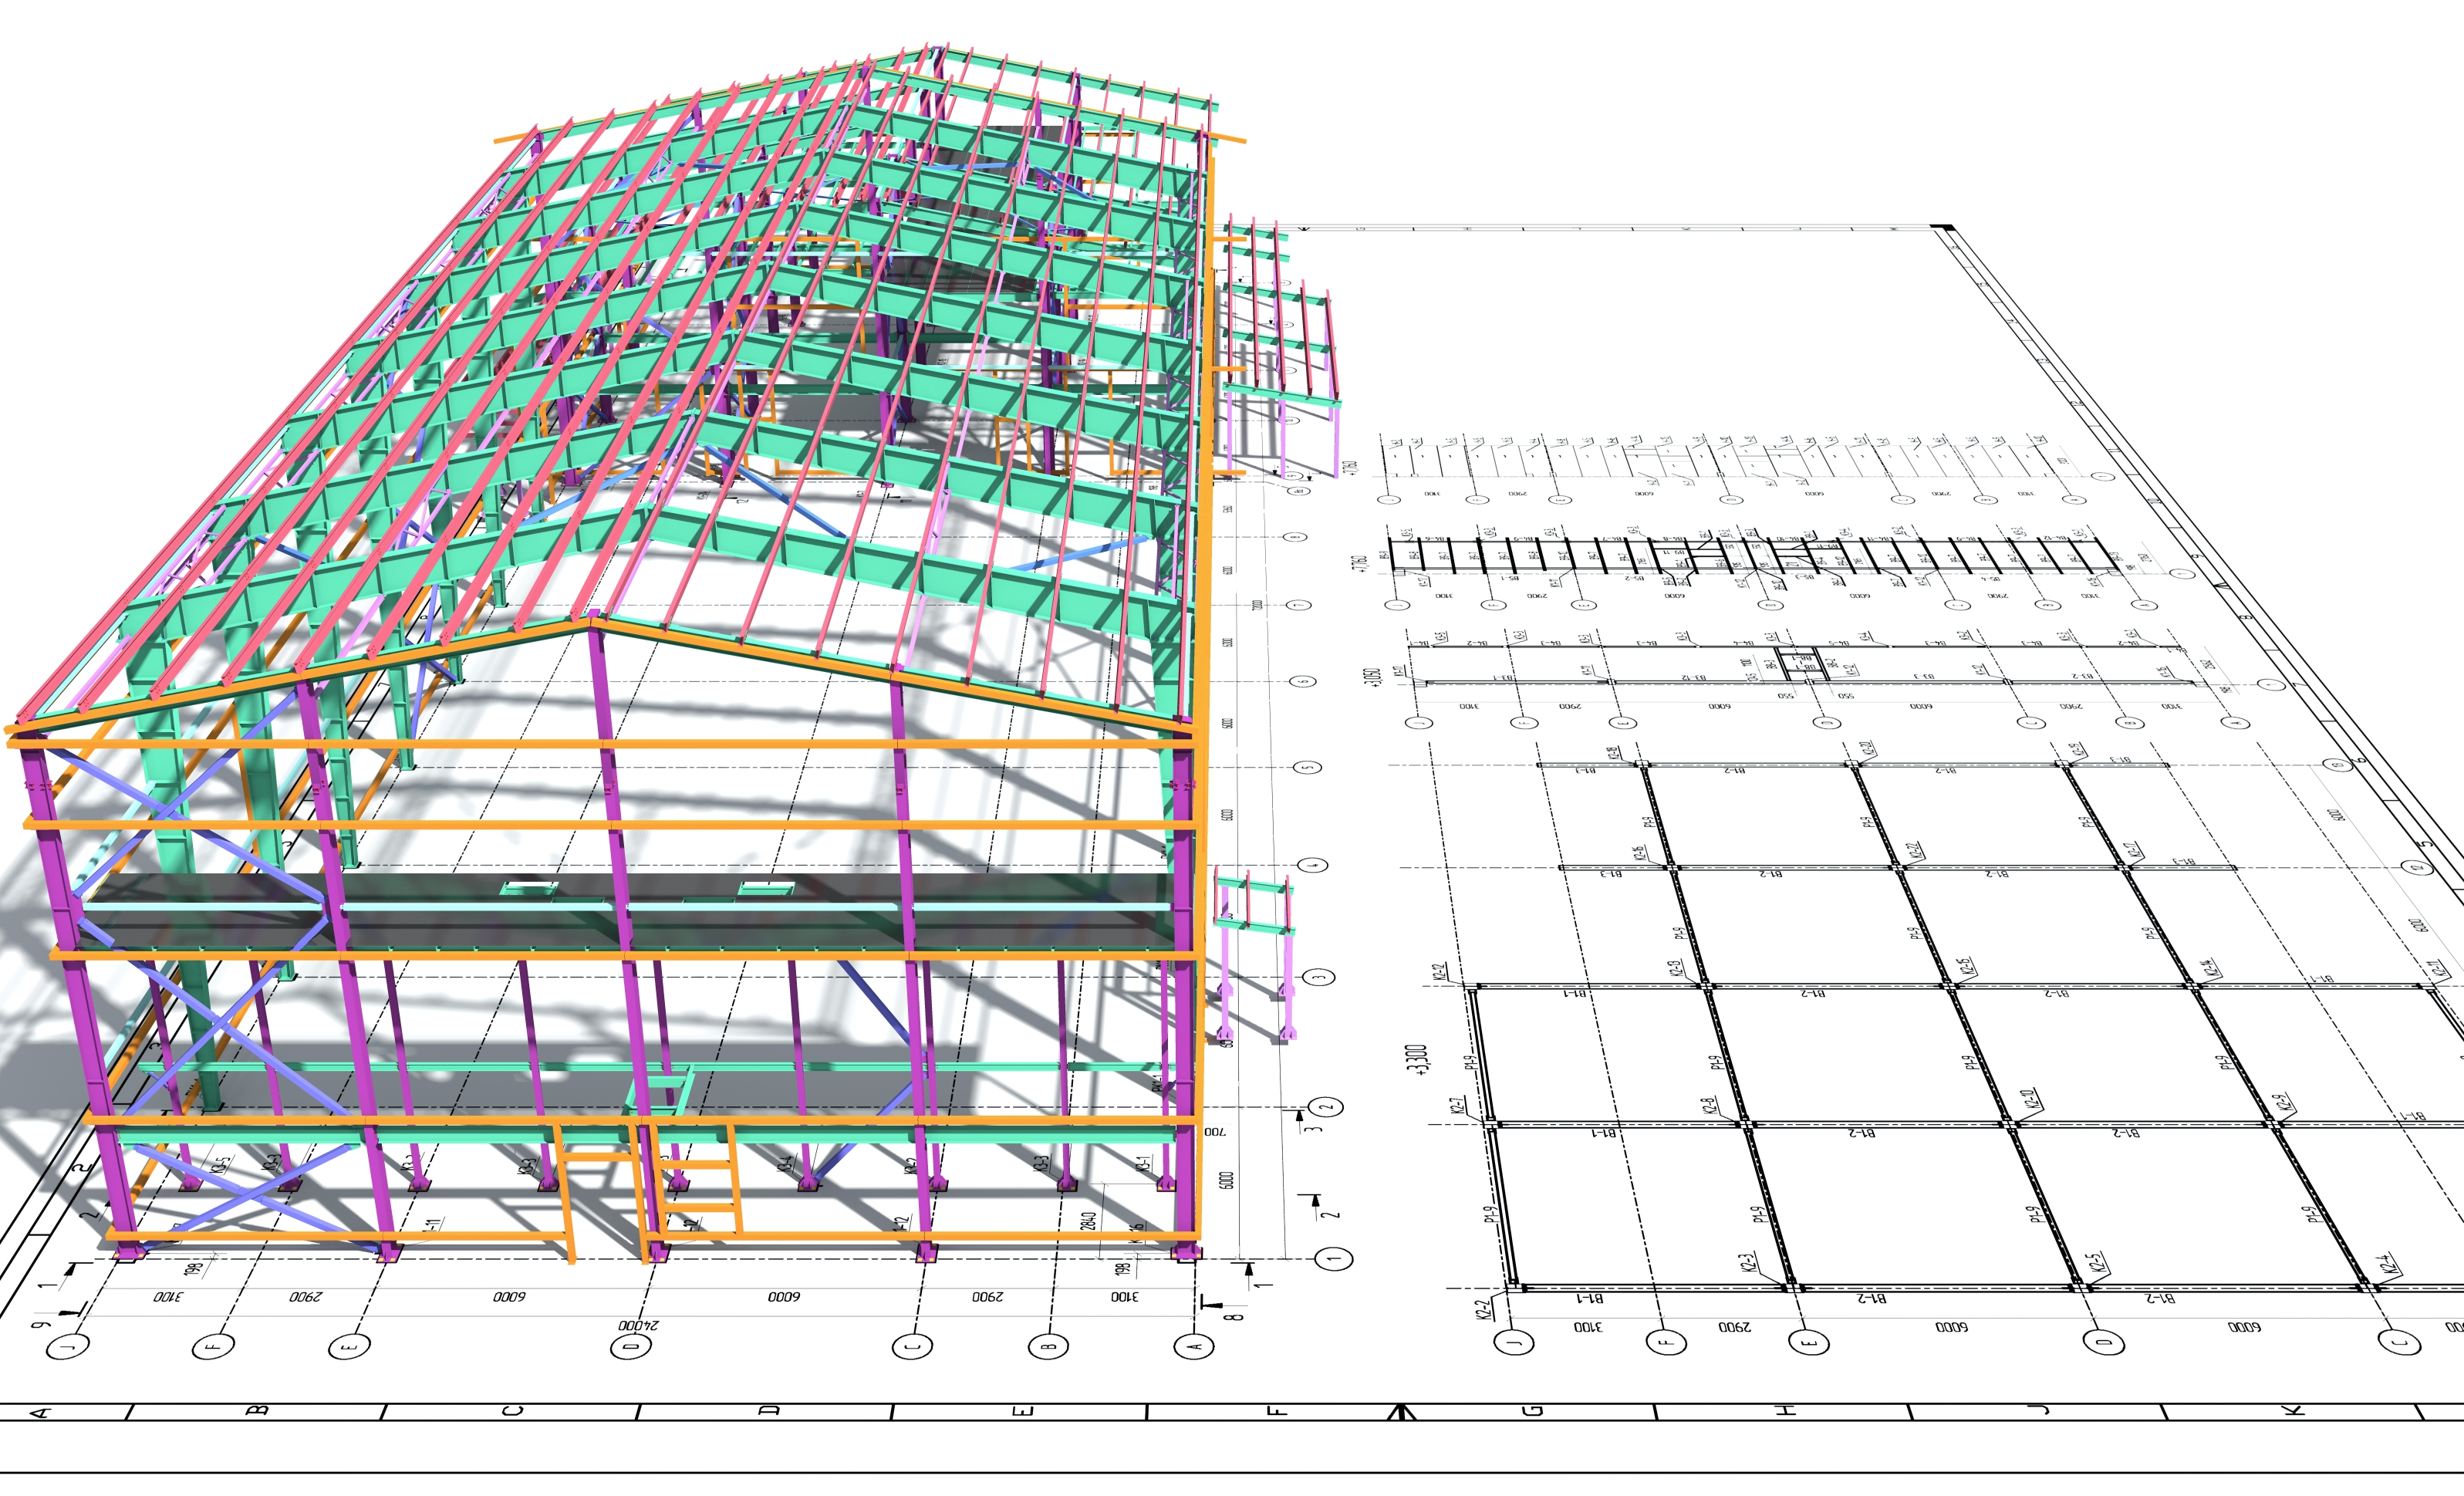 Prefabricated Building Plan